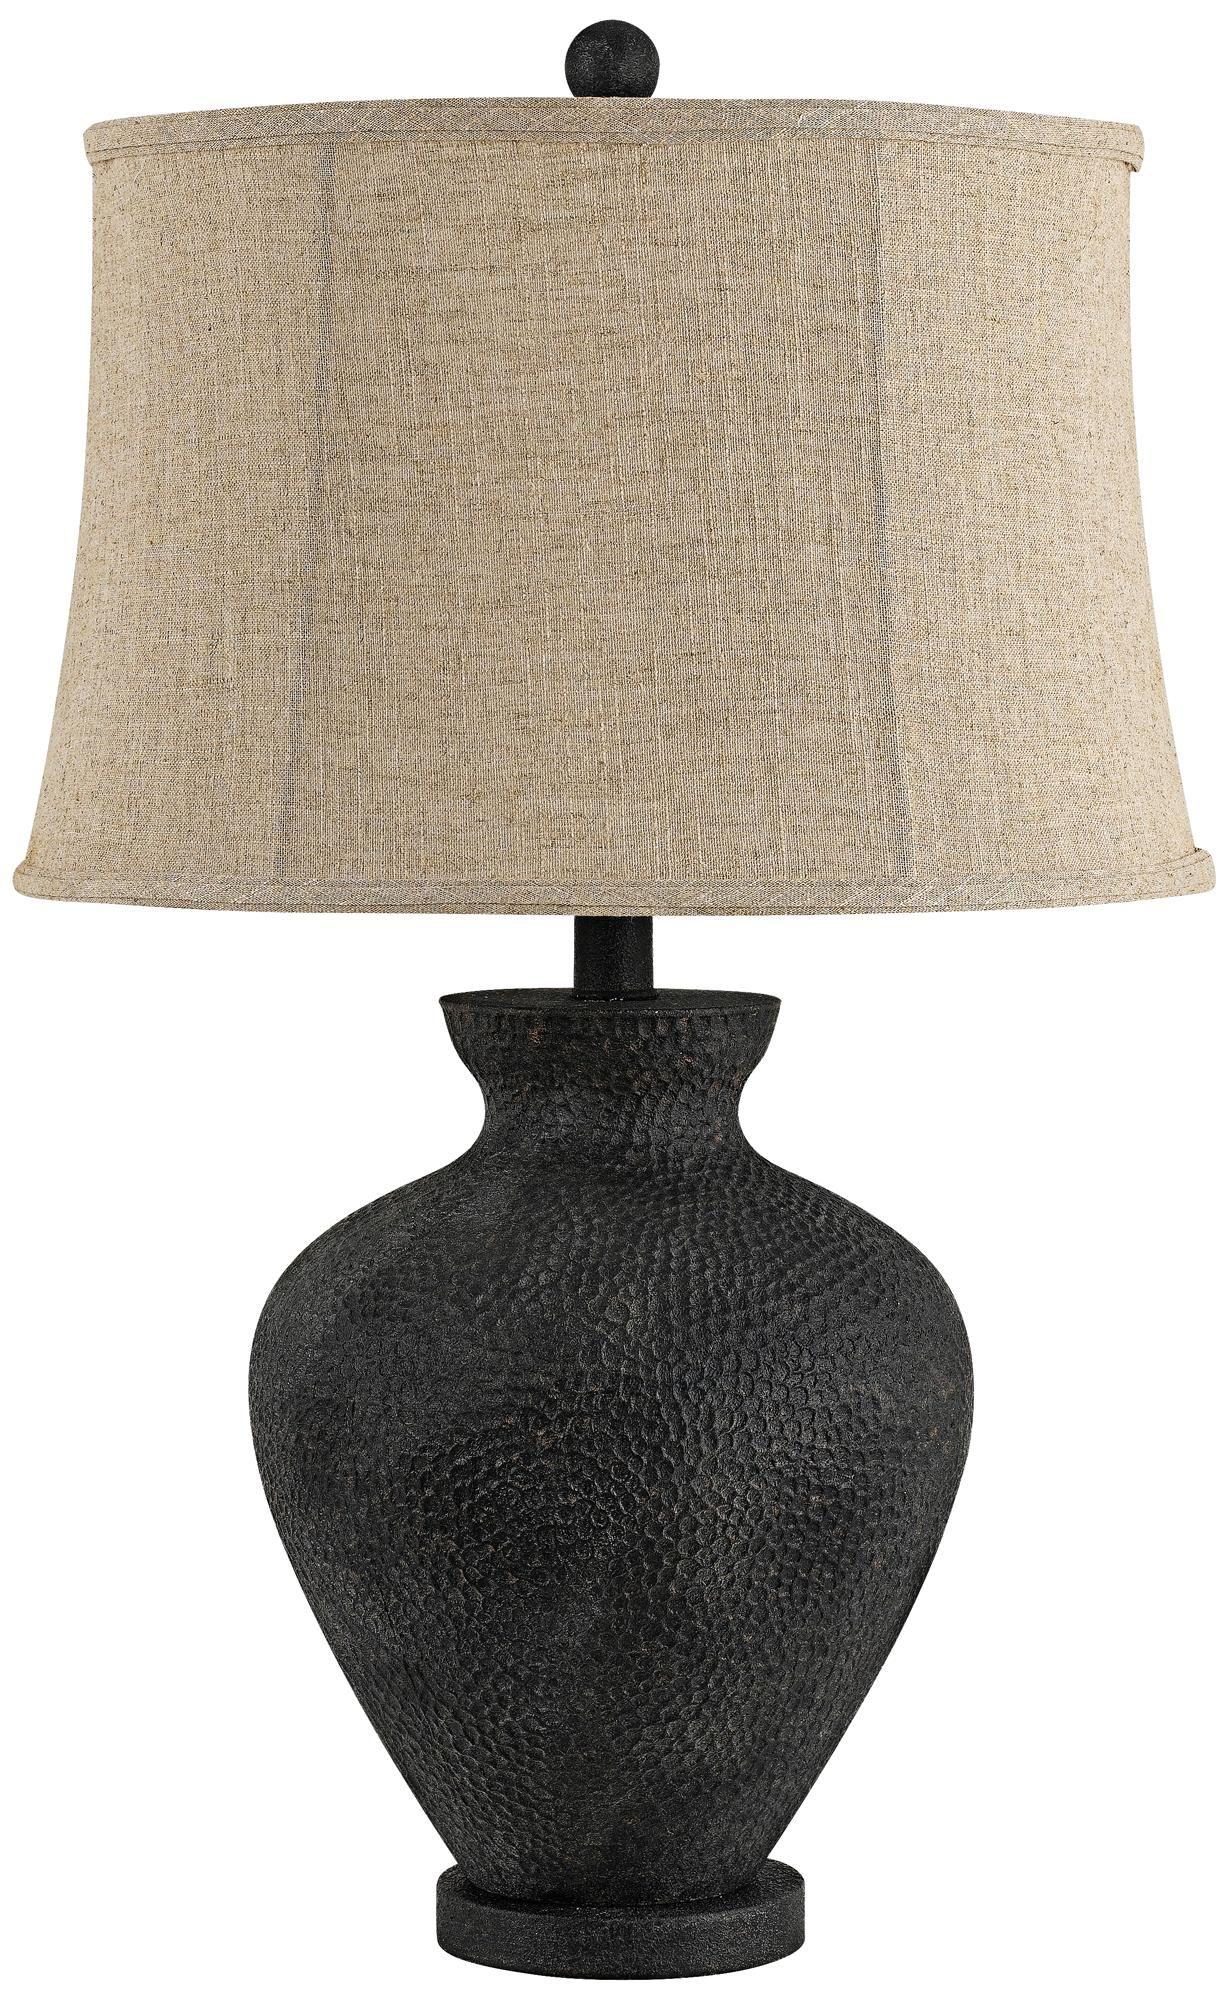 Ahumada Charcoal Black Hammered Metal Table Lamp Table Lamp